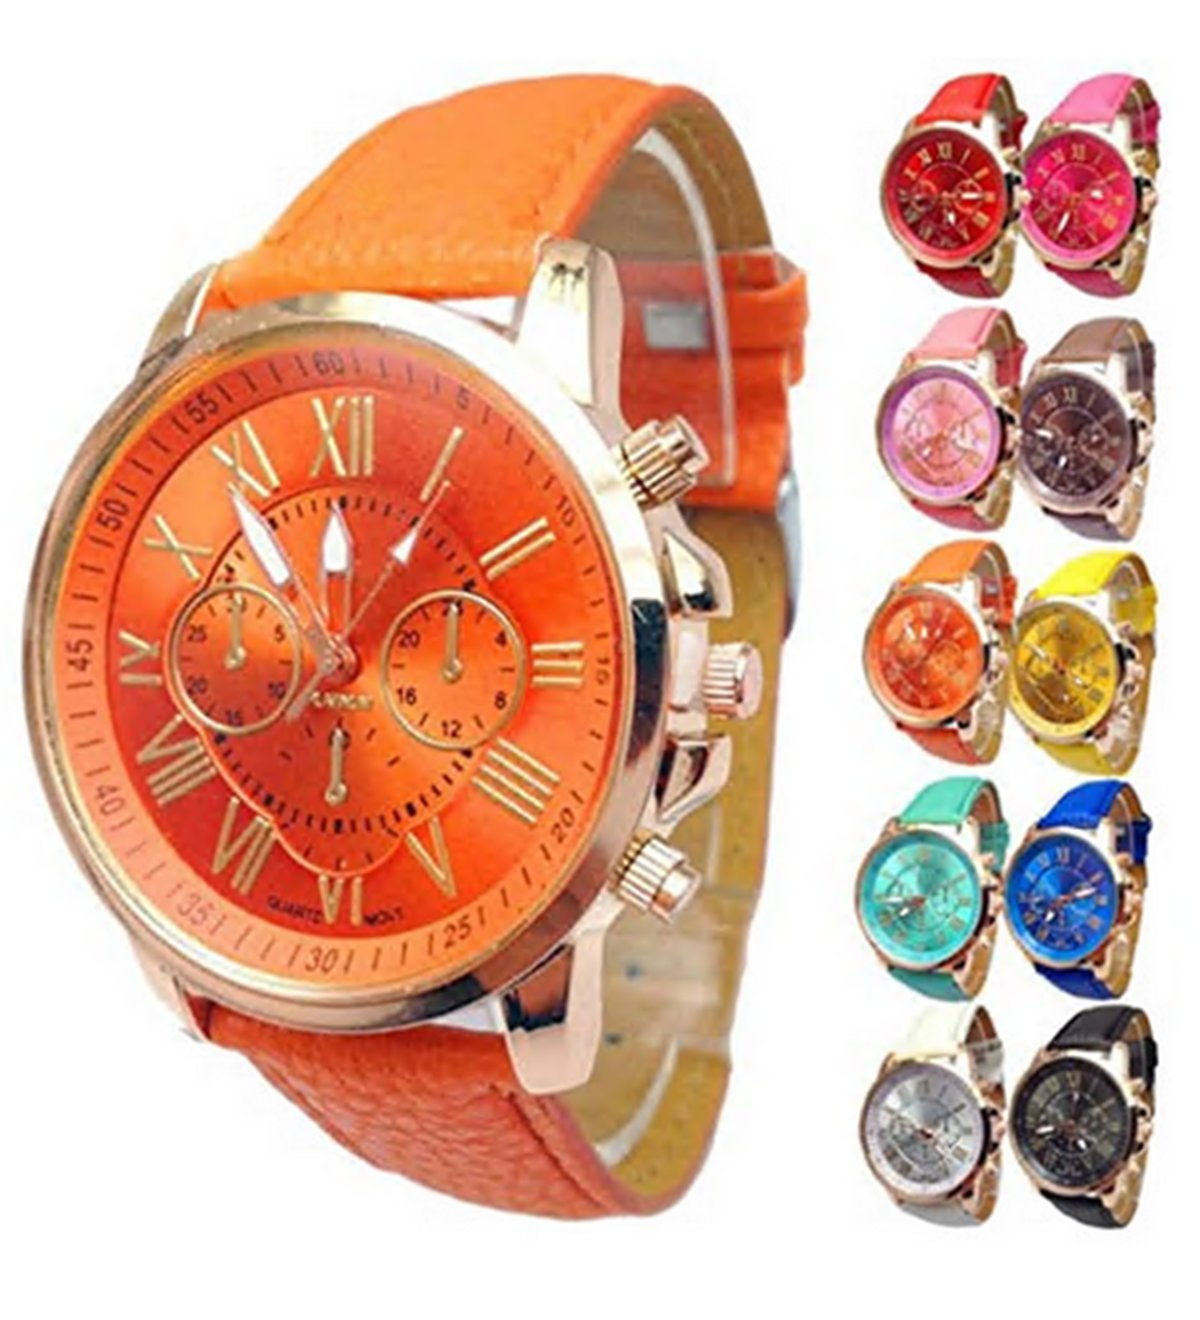 Women watch wholesale Faux Leather band strap Analog Quartz Wrist Watch set cheap on sale clearance 10PC (10PC Set)